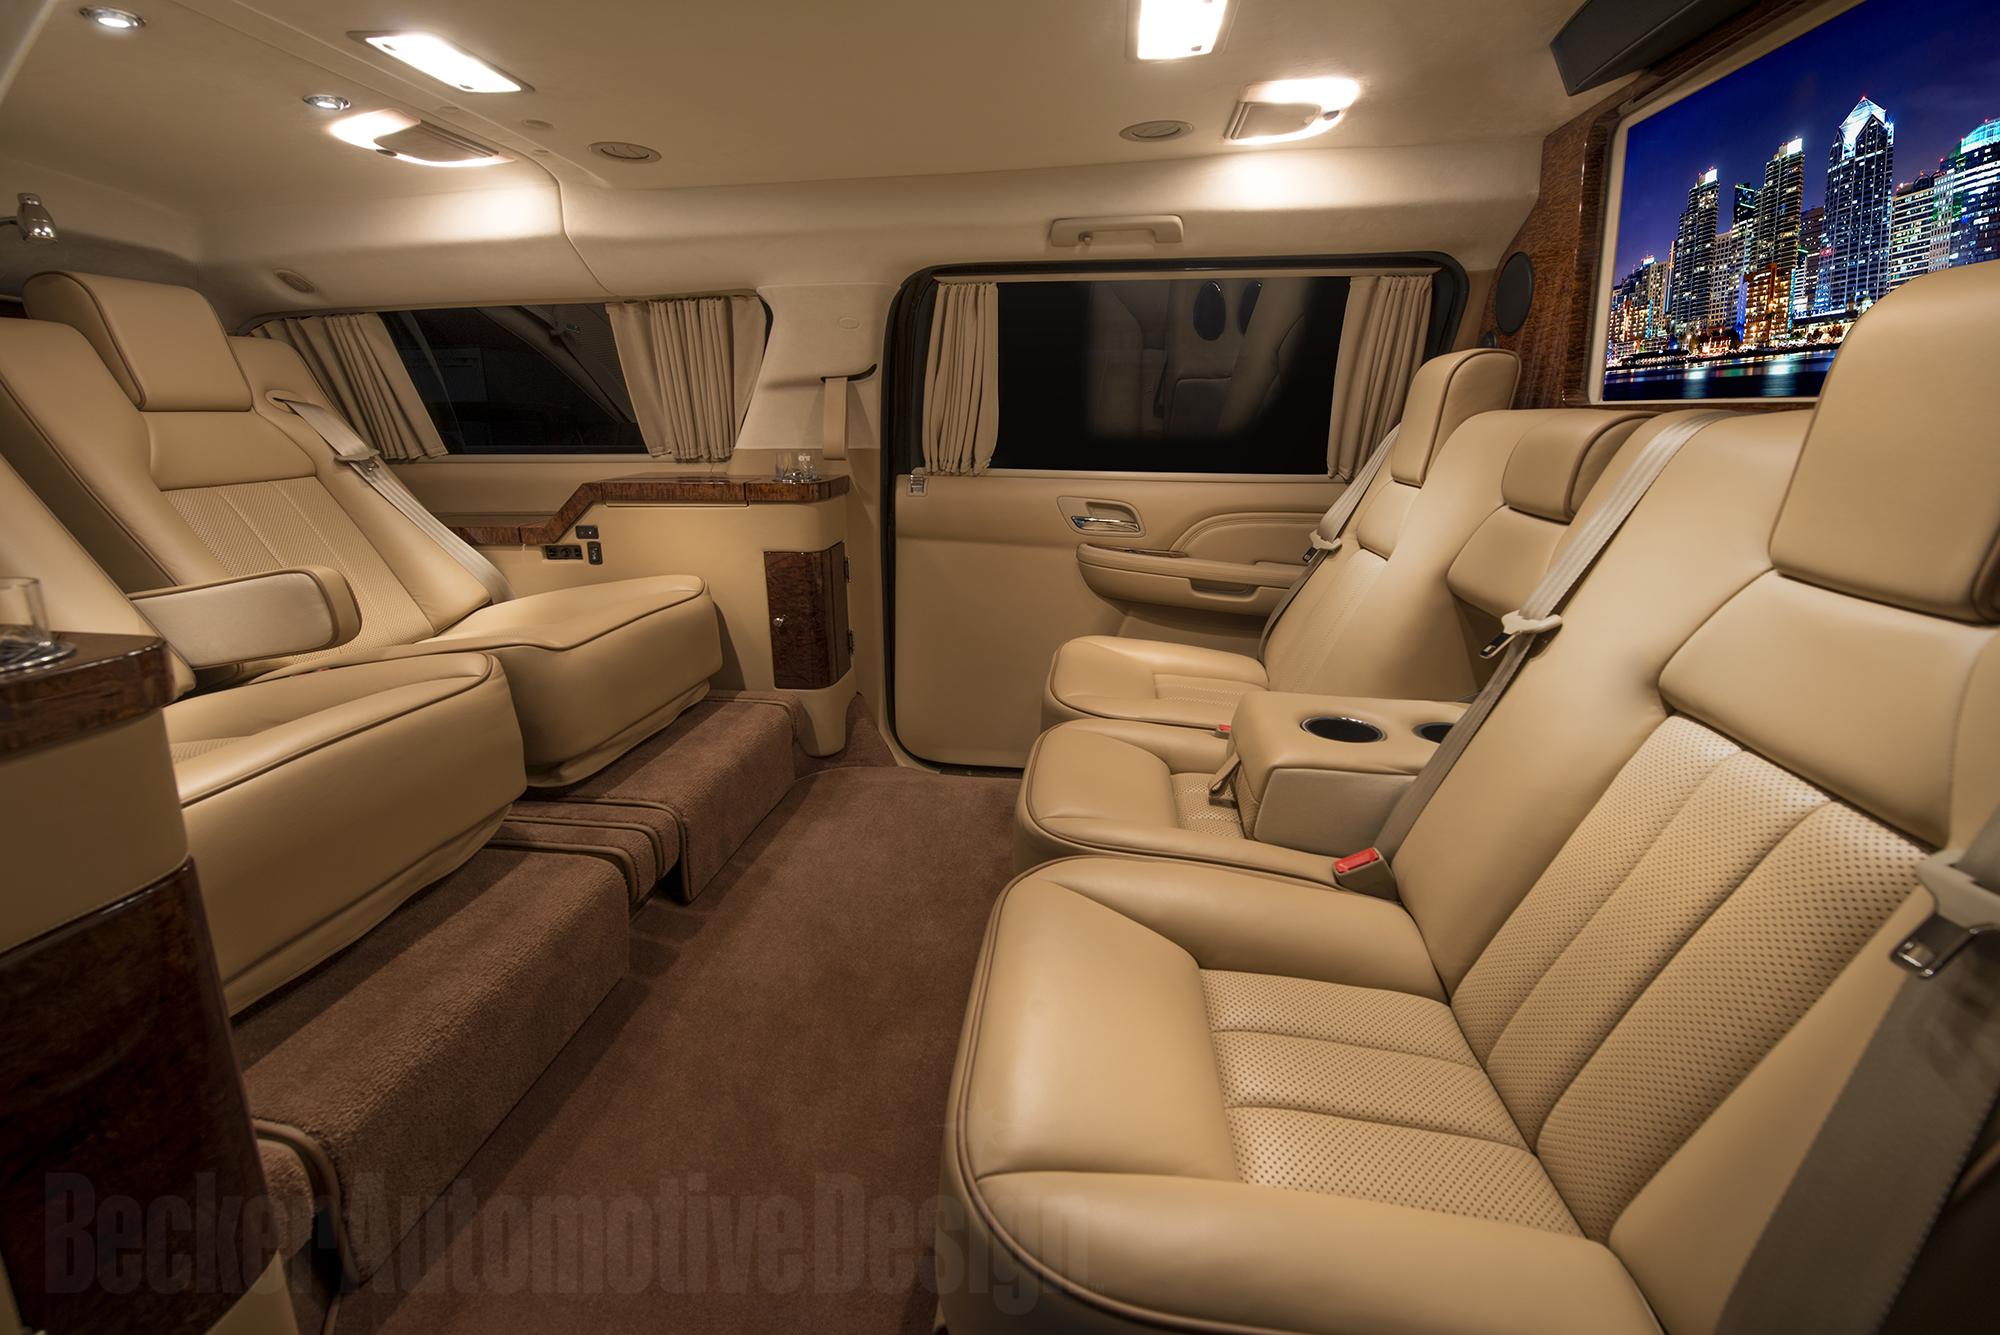 cadillac escalade 2015 interior customized. your time is most valuable asset cadillac escalade 2015 interior customized g